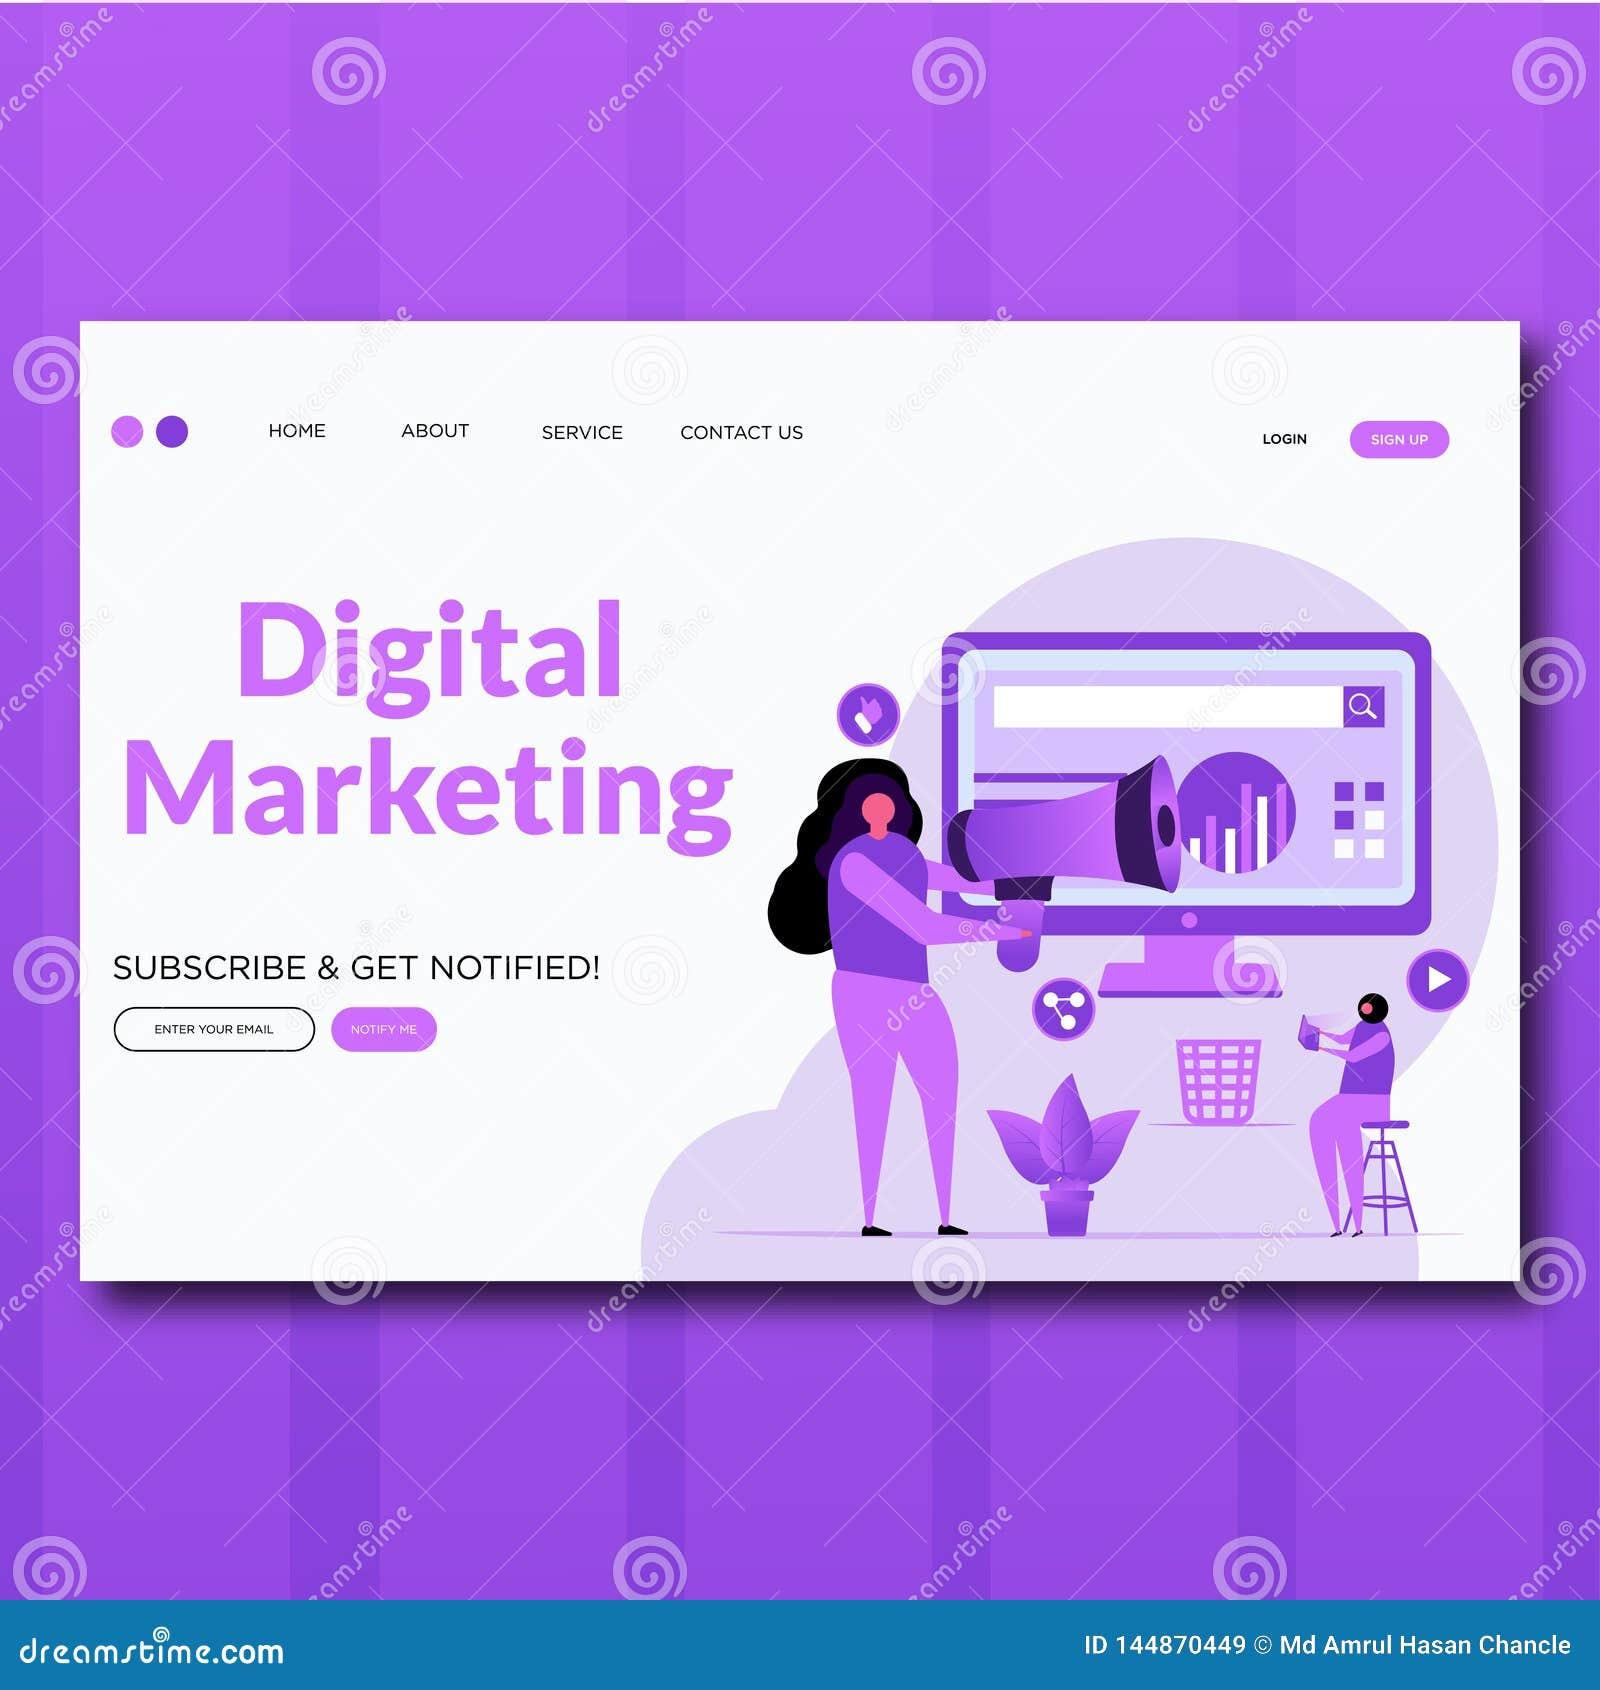 Digital Marketing- Vector flat style Digital Marketing landing page illustration